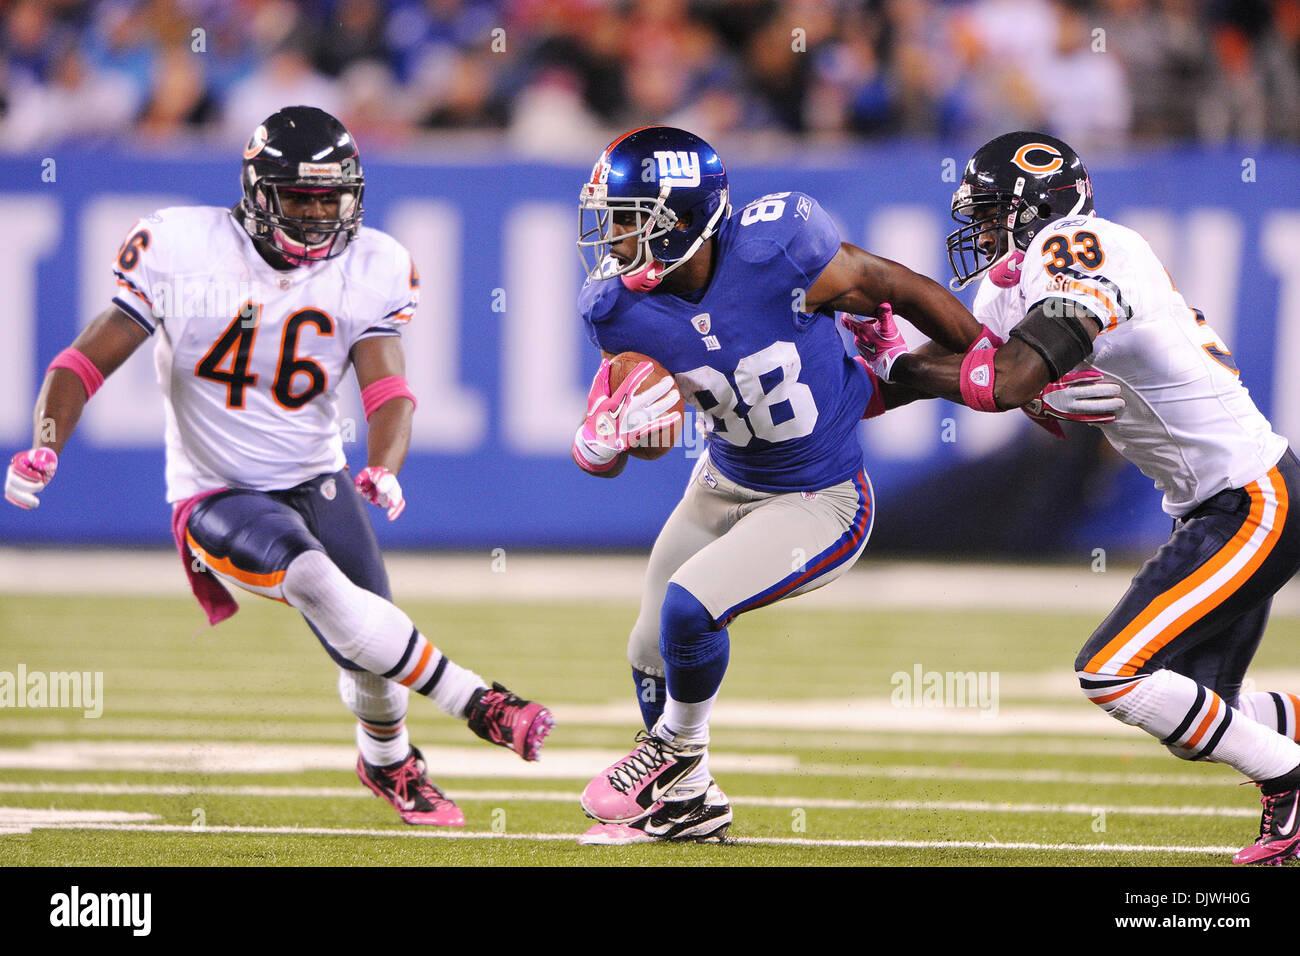 New York Giants Wide Receiver Hakeem Nicks 88 Evades Chicago Bears